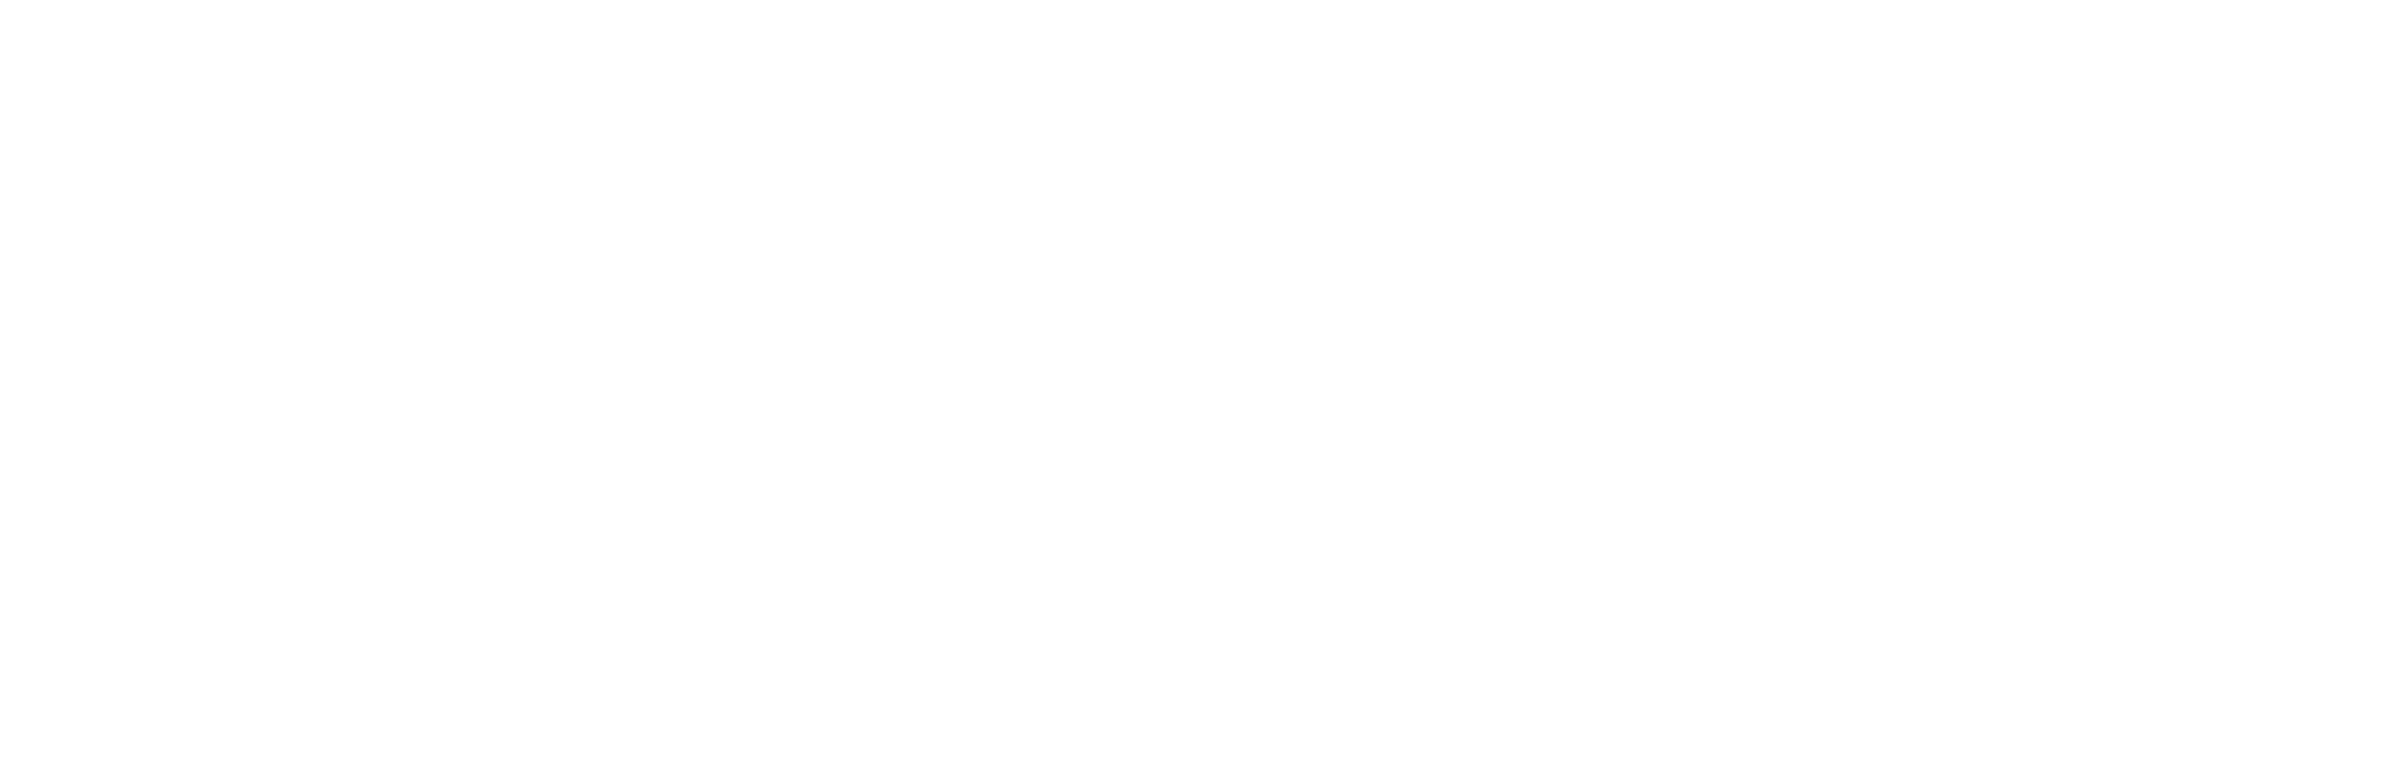 GCF Task Force